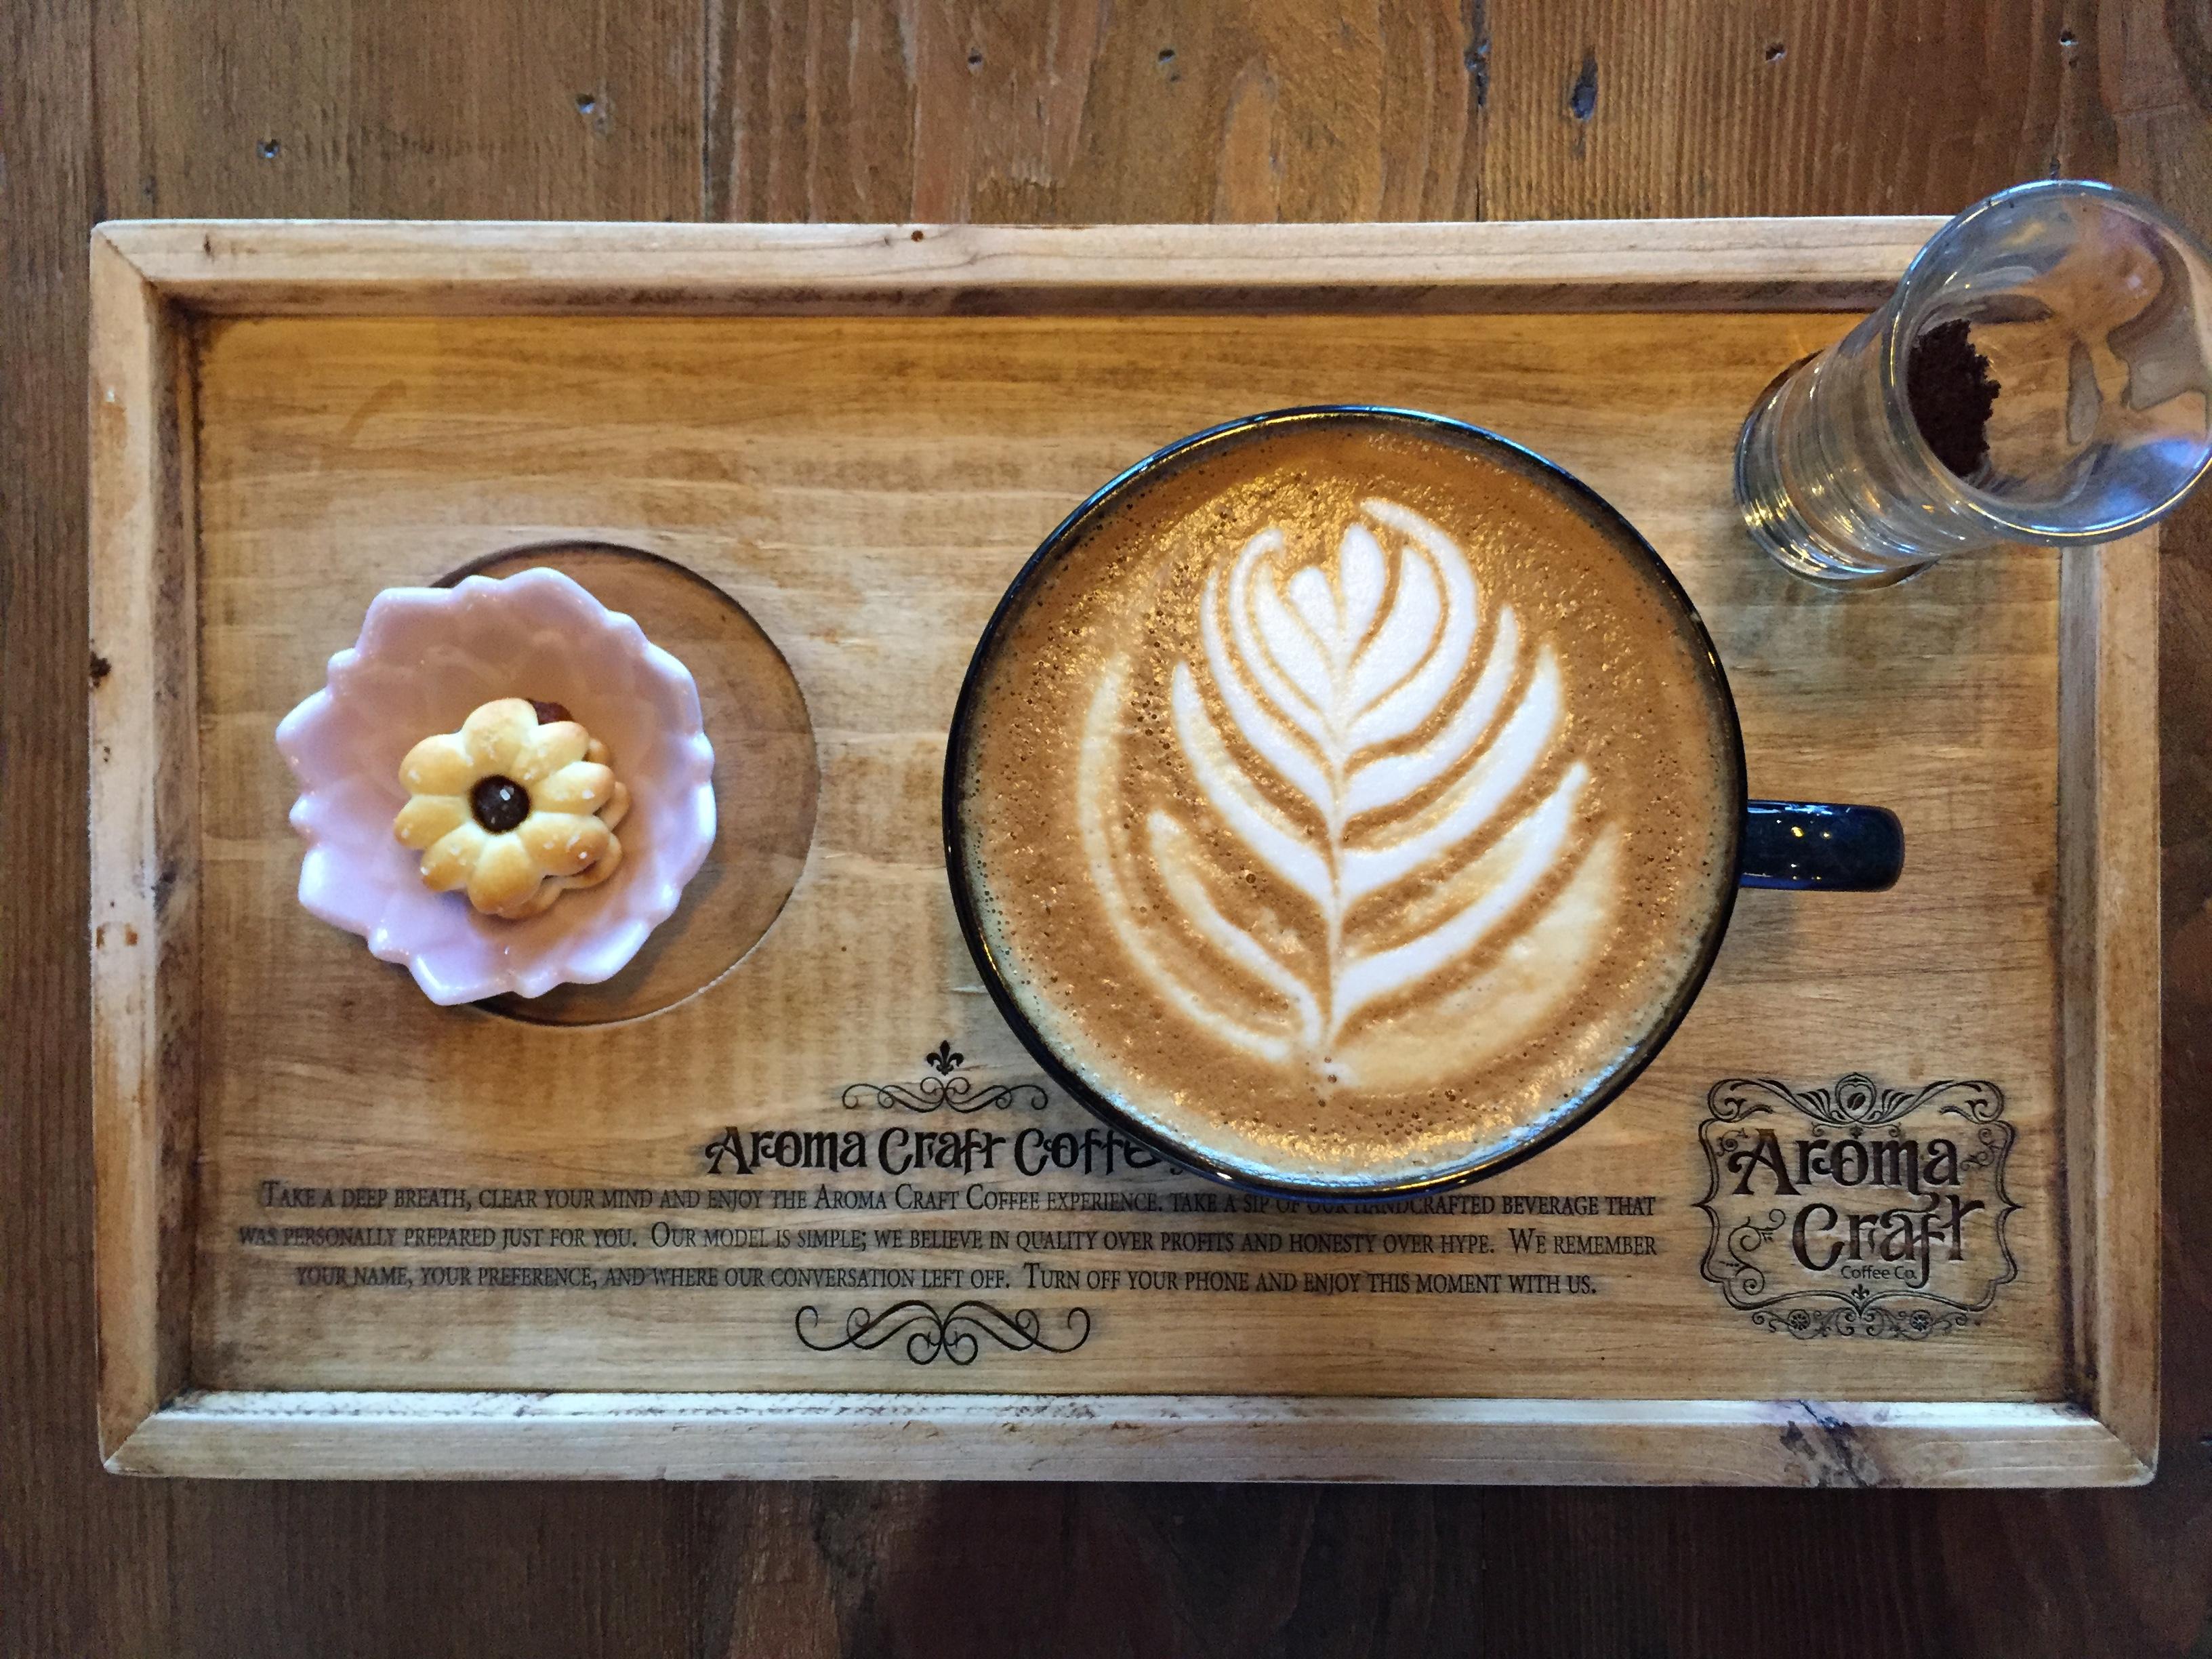 Aroma Craft Coffee